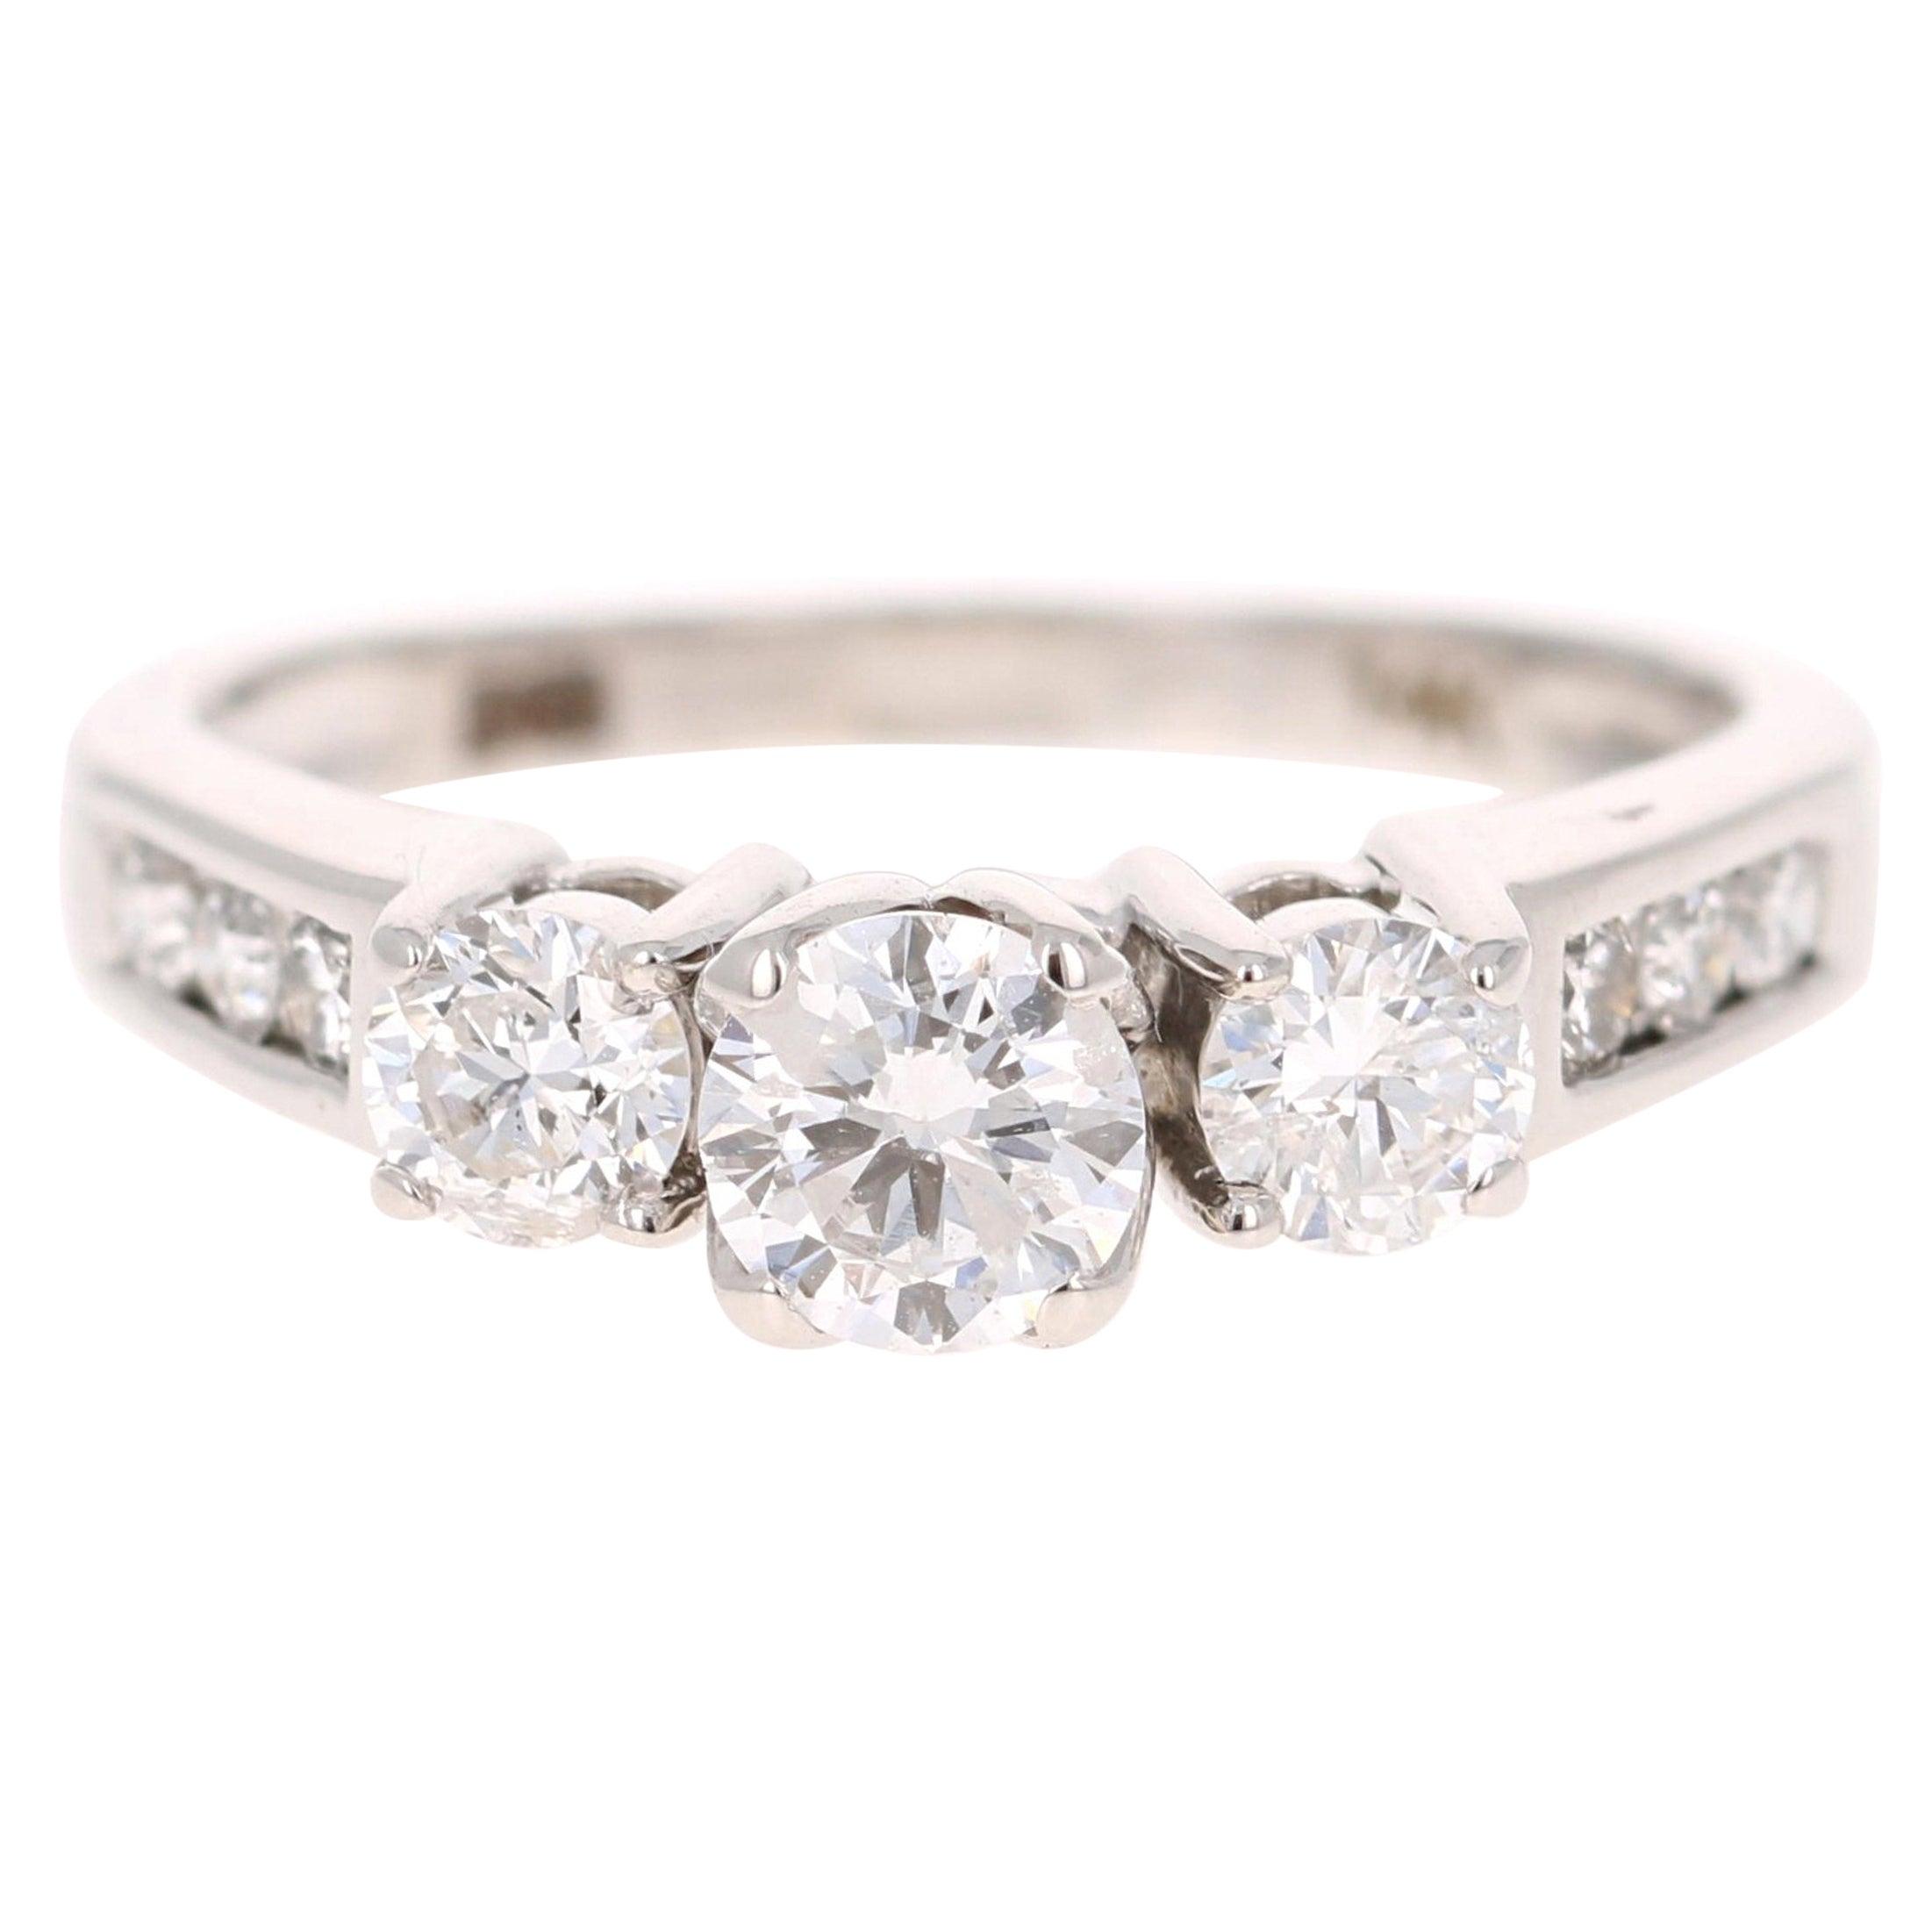 14 Karat White Gold Radiant Cut 1.00 Carats Peridot Diamond Pendant